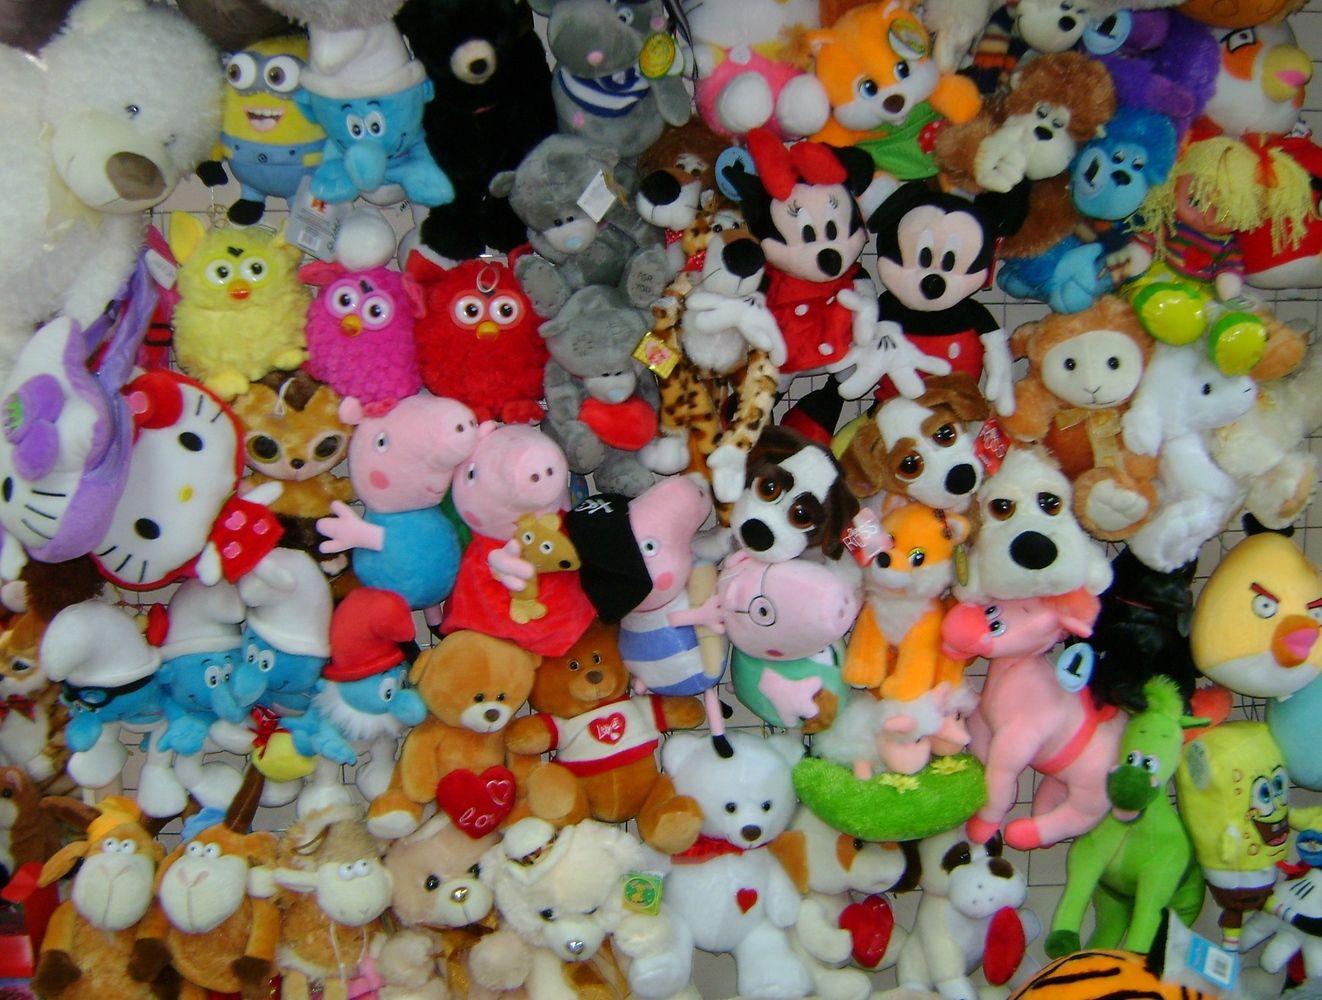 ВПредгорном районе похищены игрушки на3 млн. руб.